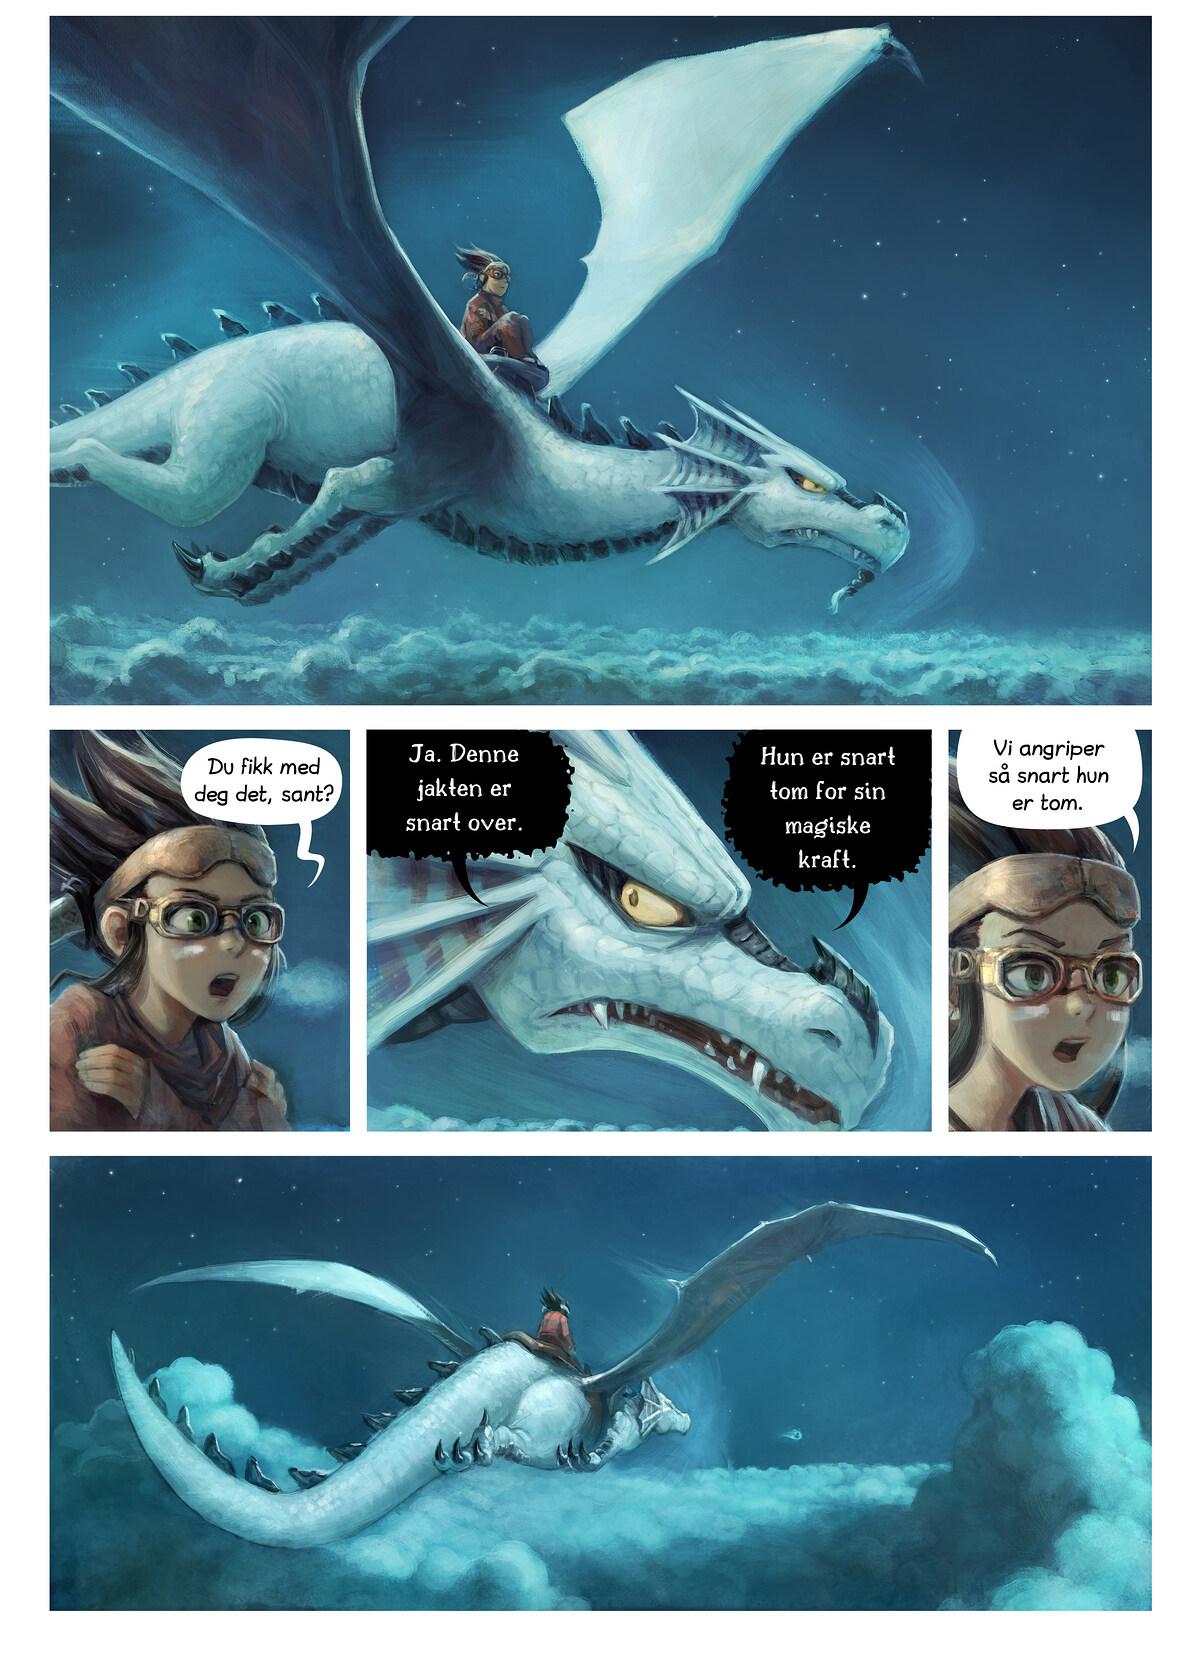 Episode 35: Tid for ettertanke, Page 3